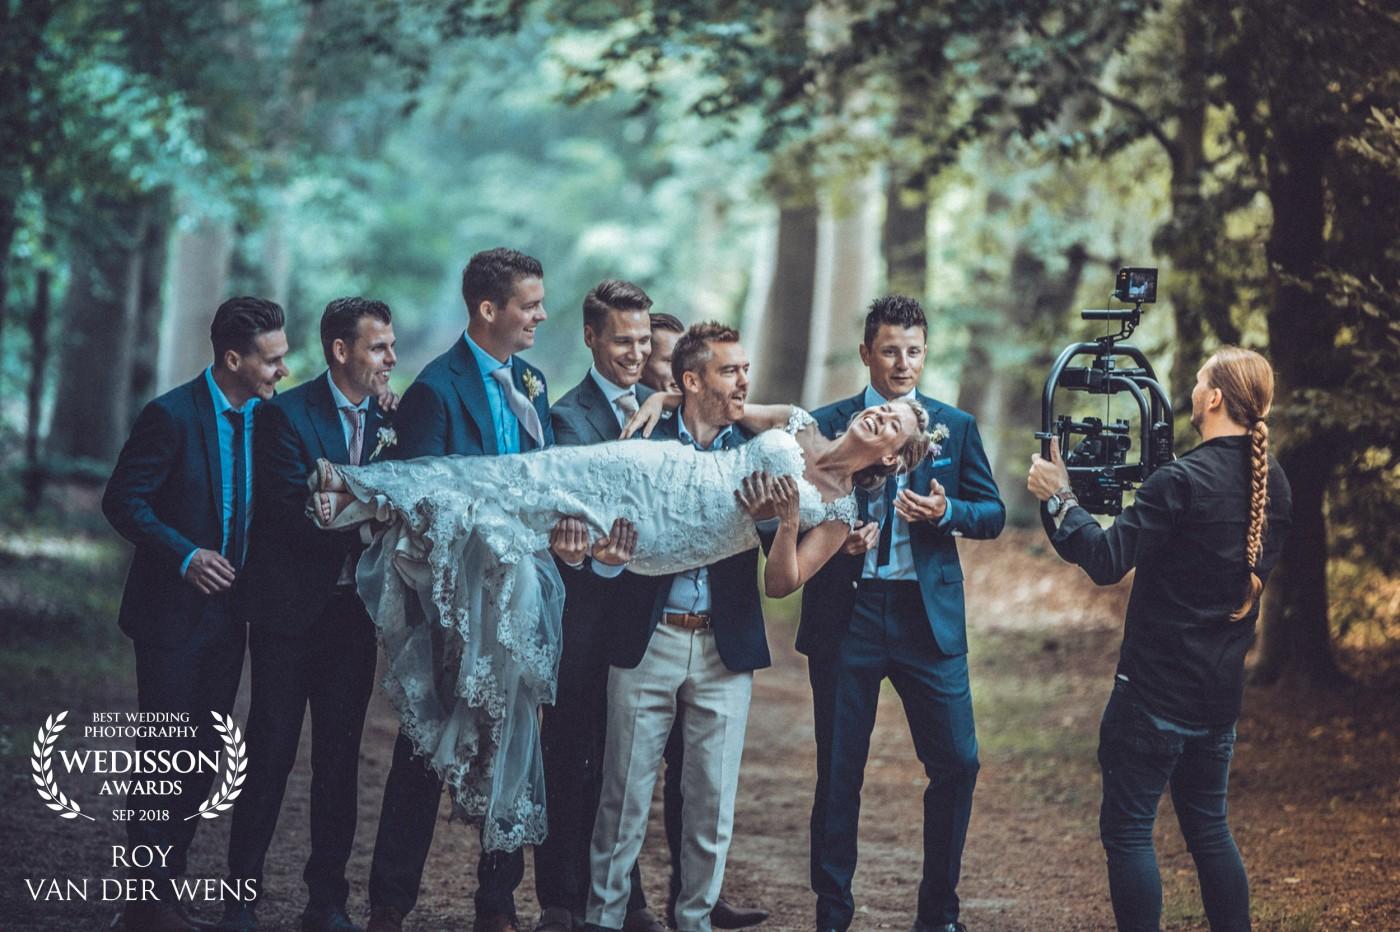 1e prijs, best wedding photographer, sept 2018